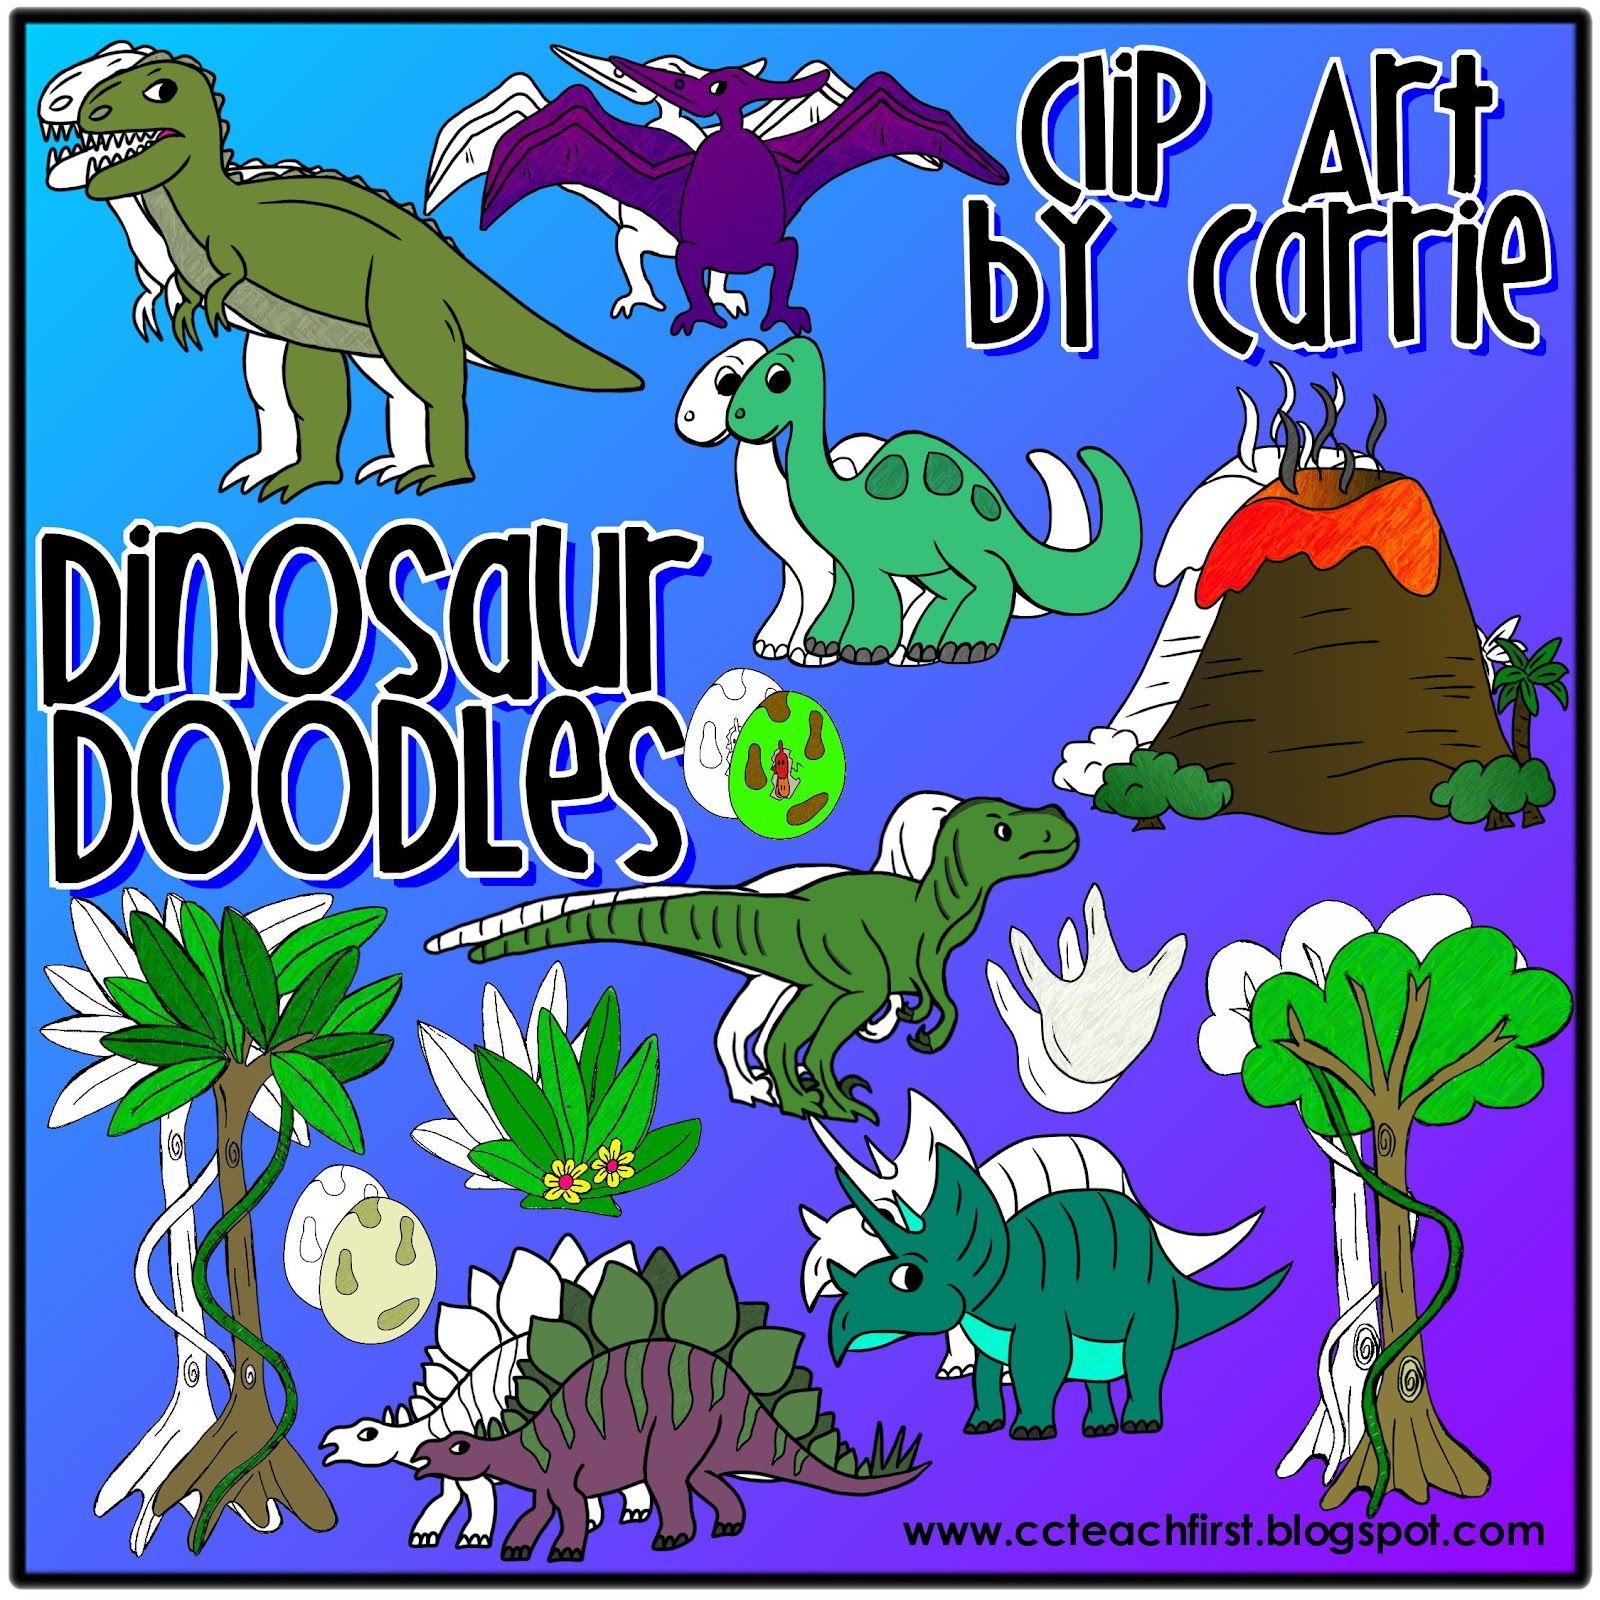 Dinosaur Doodles By Clip Art By Carrie Teachfirst